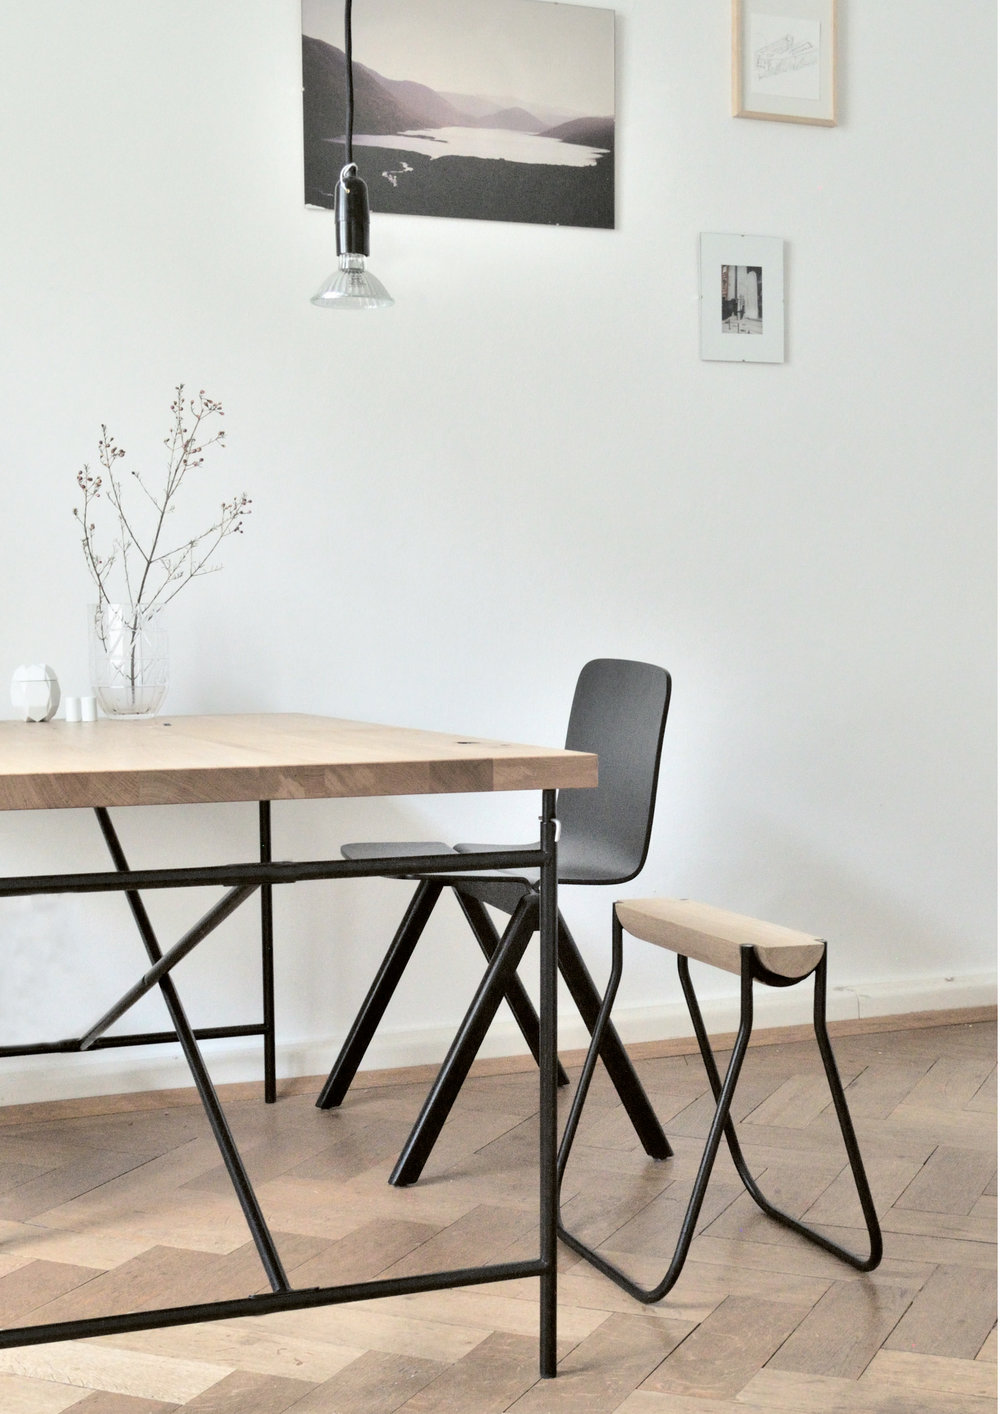 6040 Stool designed by Studio Stephan Schmid